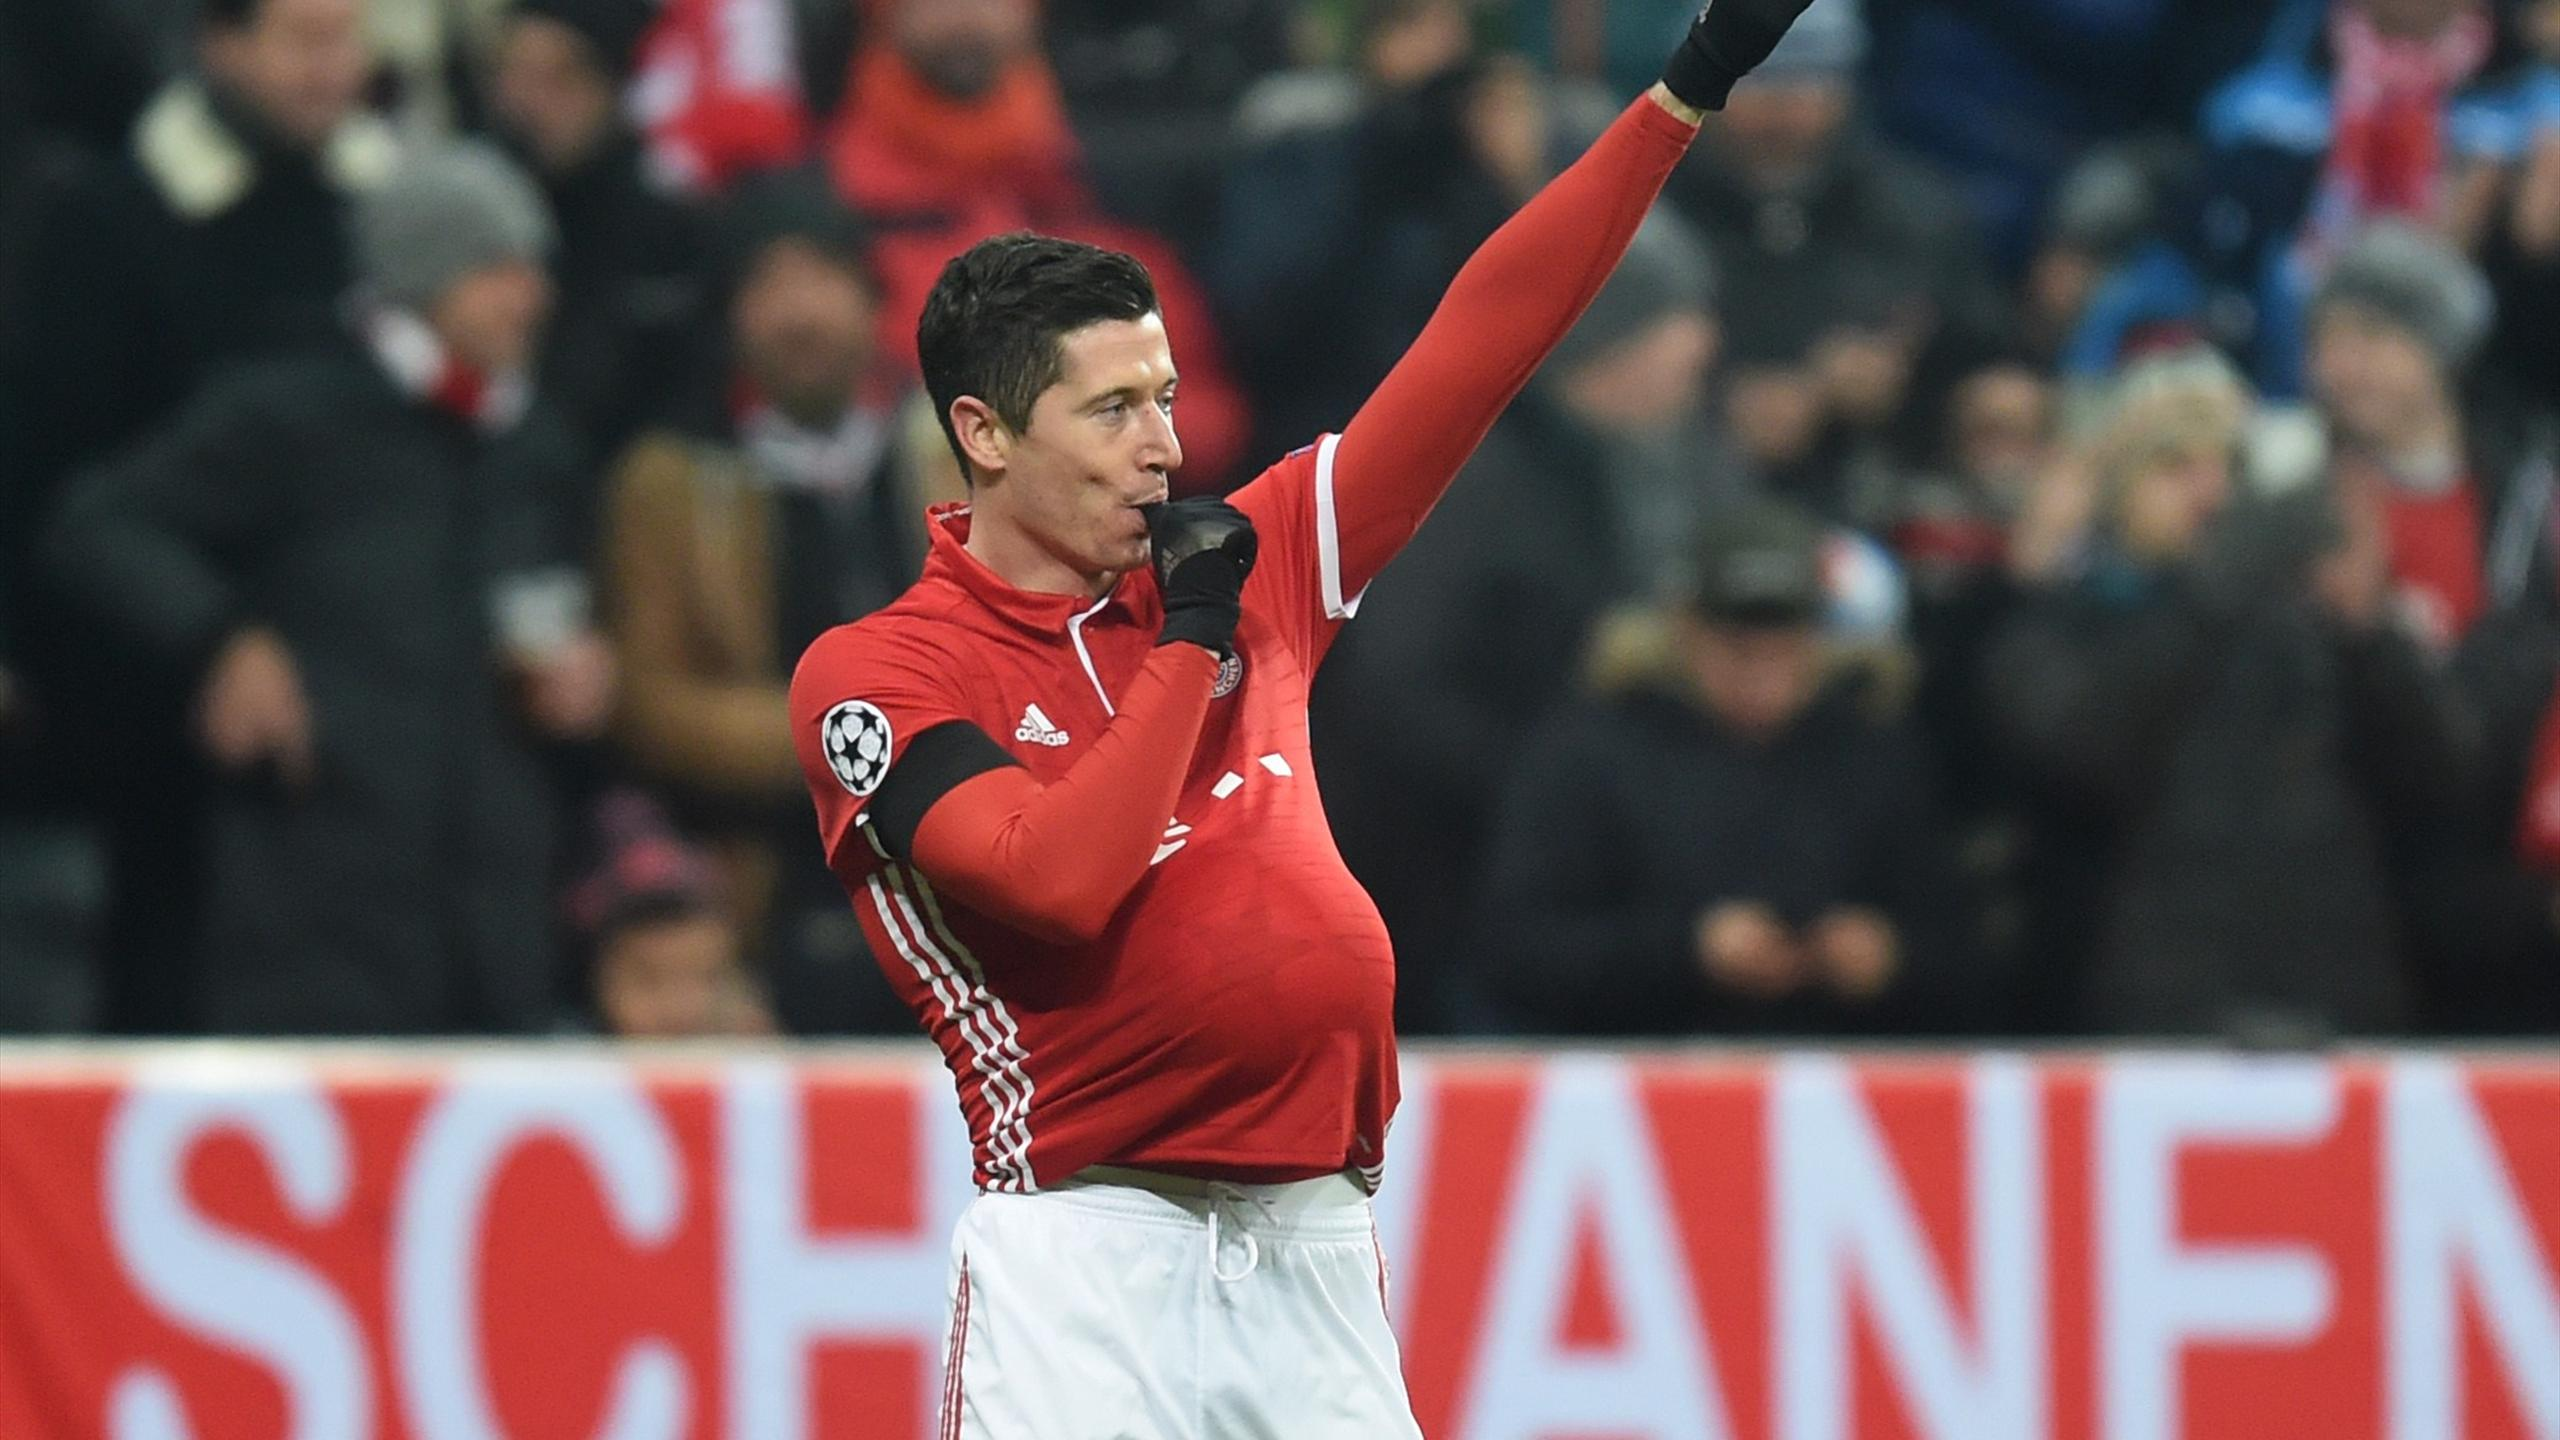 Bayern Munich's Polish striker Robert Lewandowski celebrates scoring